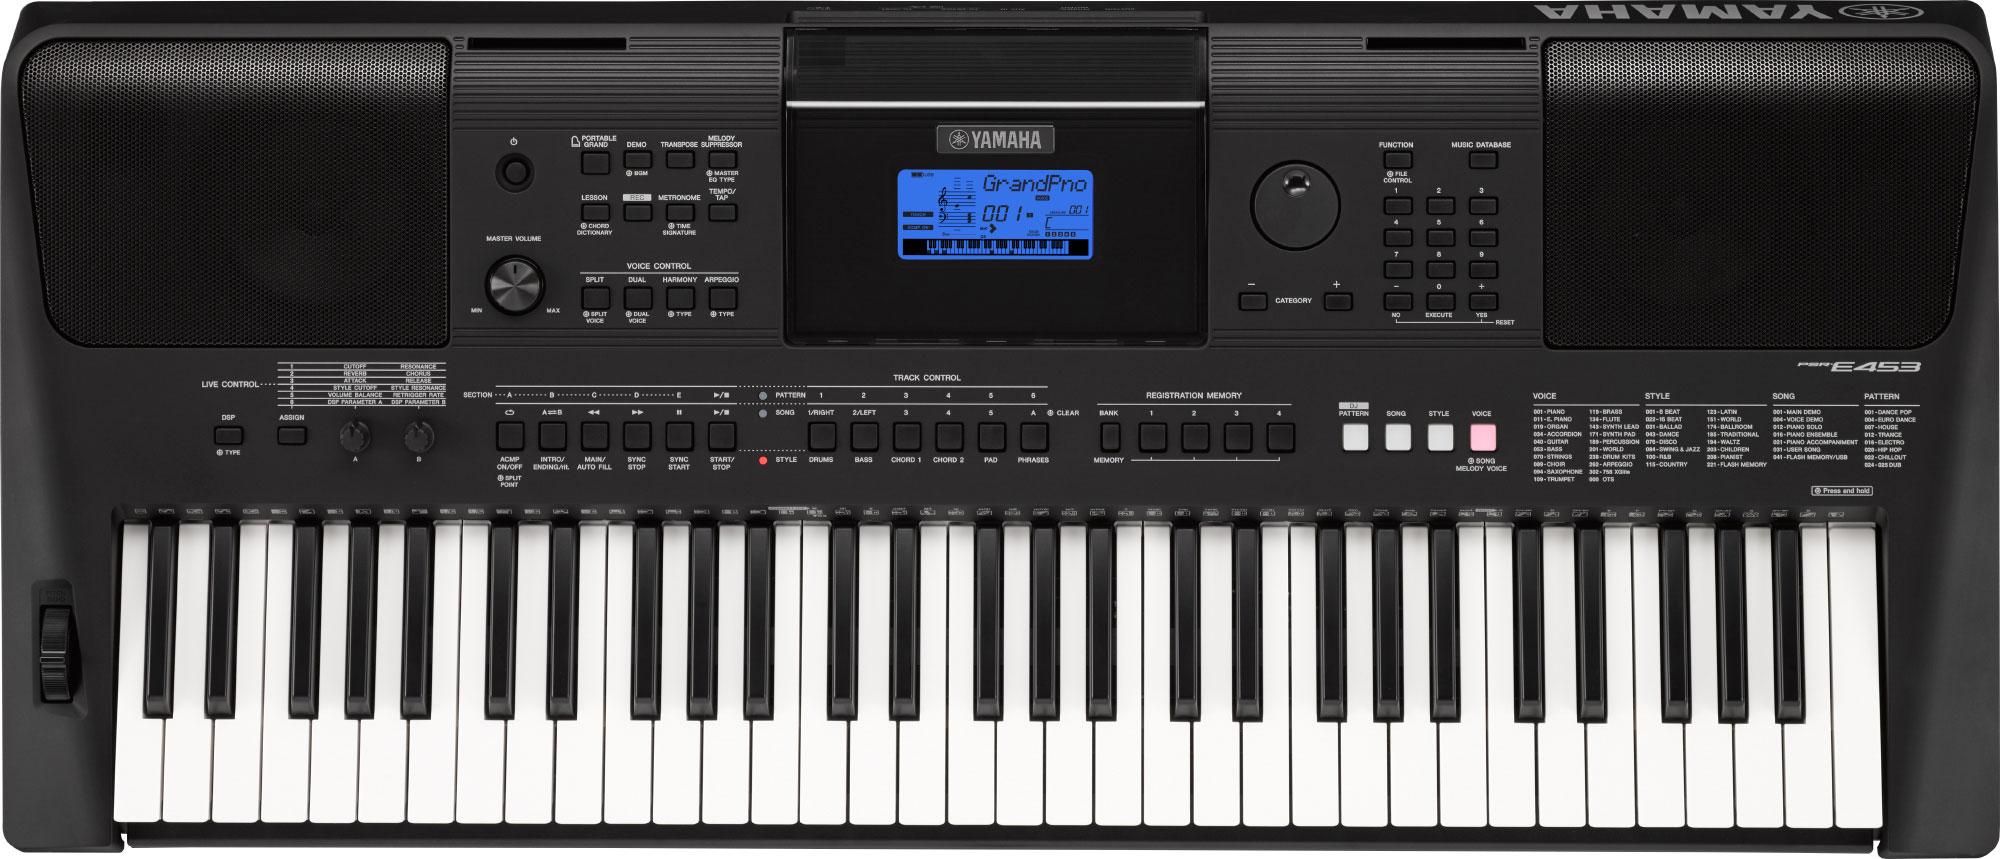 Image Result For Yamaha Keyboard Harga